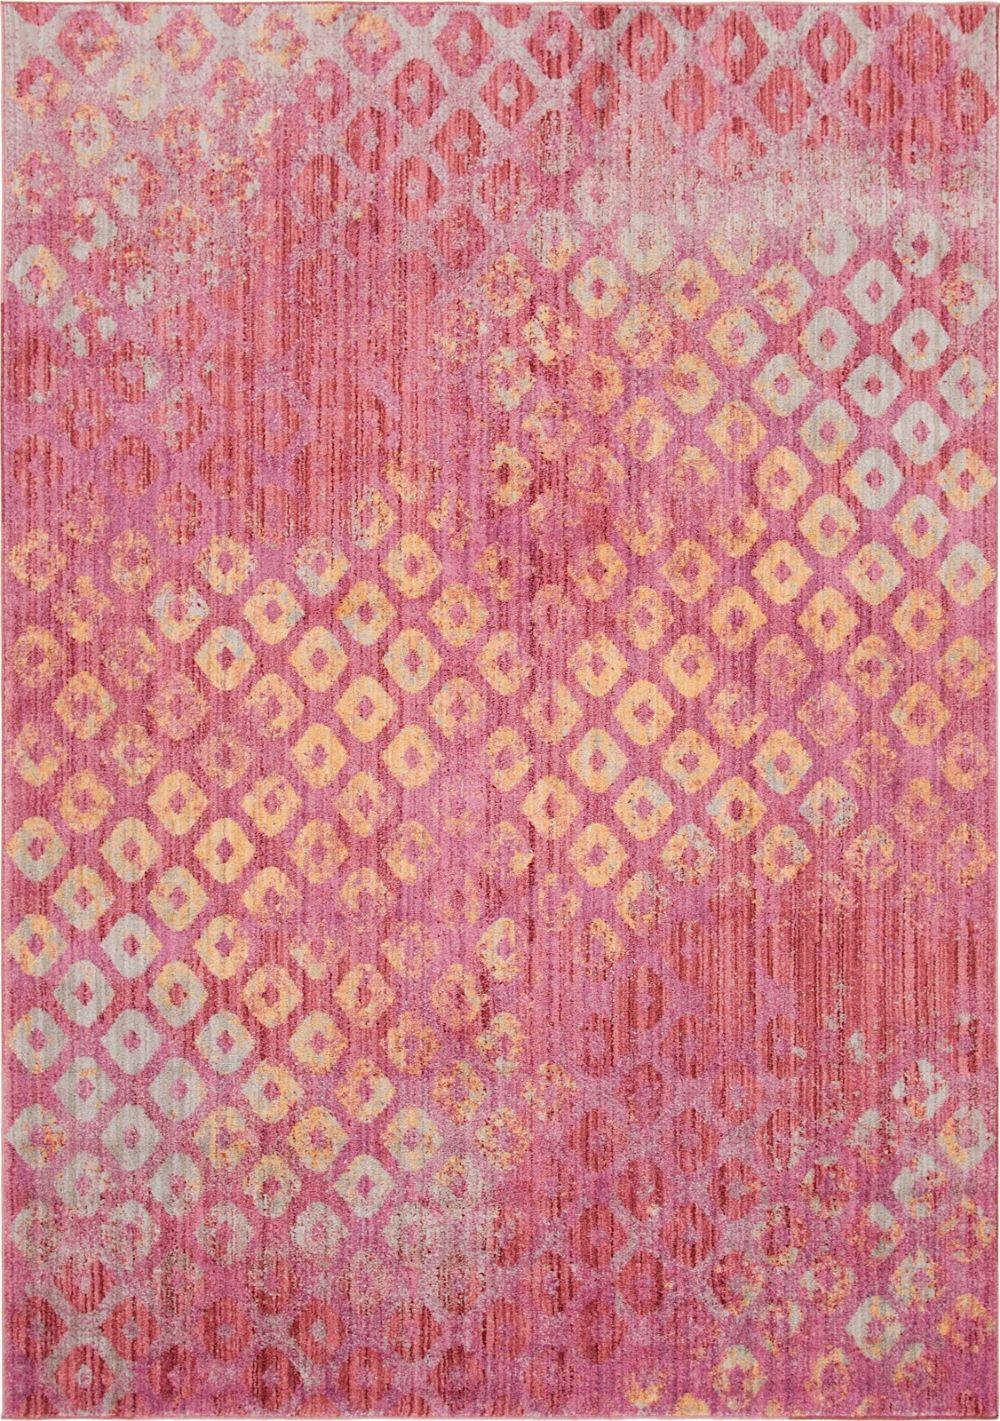 rugpal vivid contemporary area rug collection